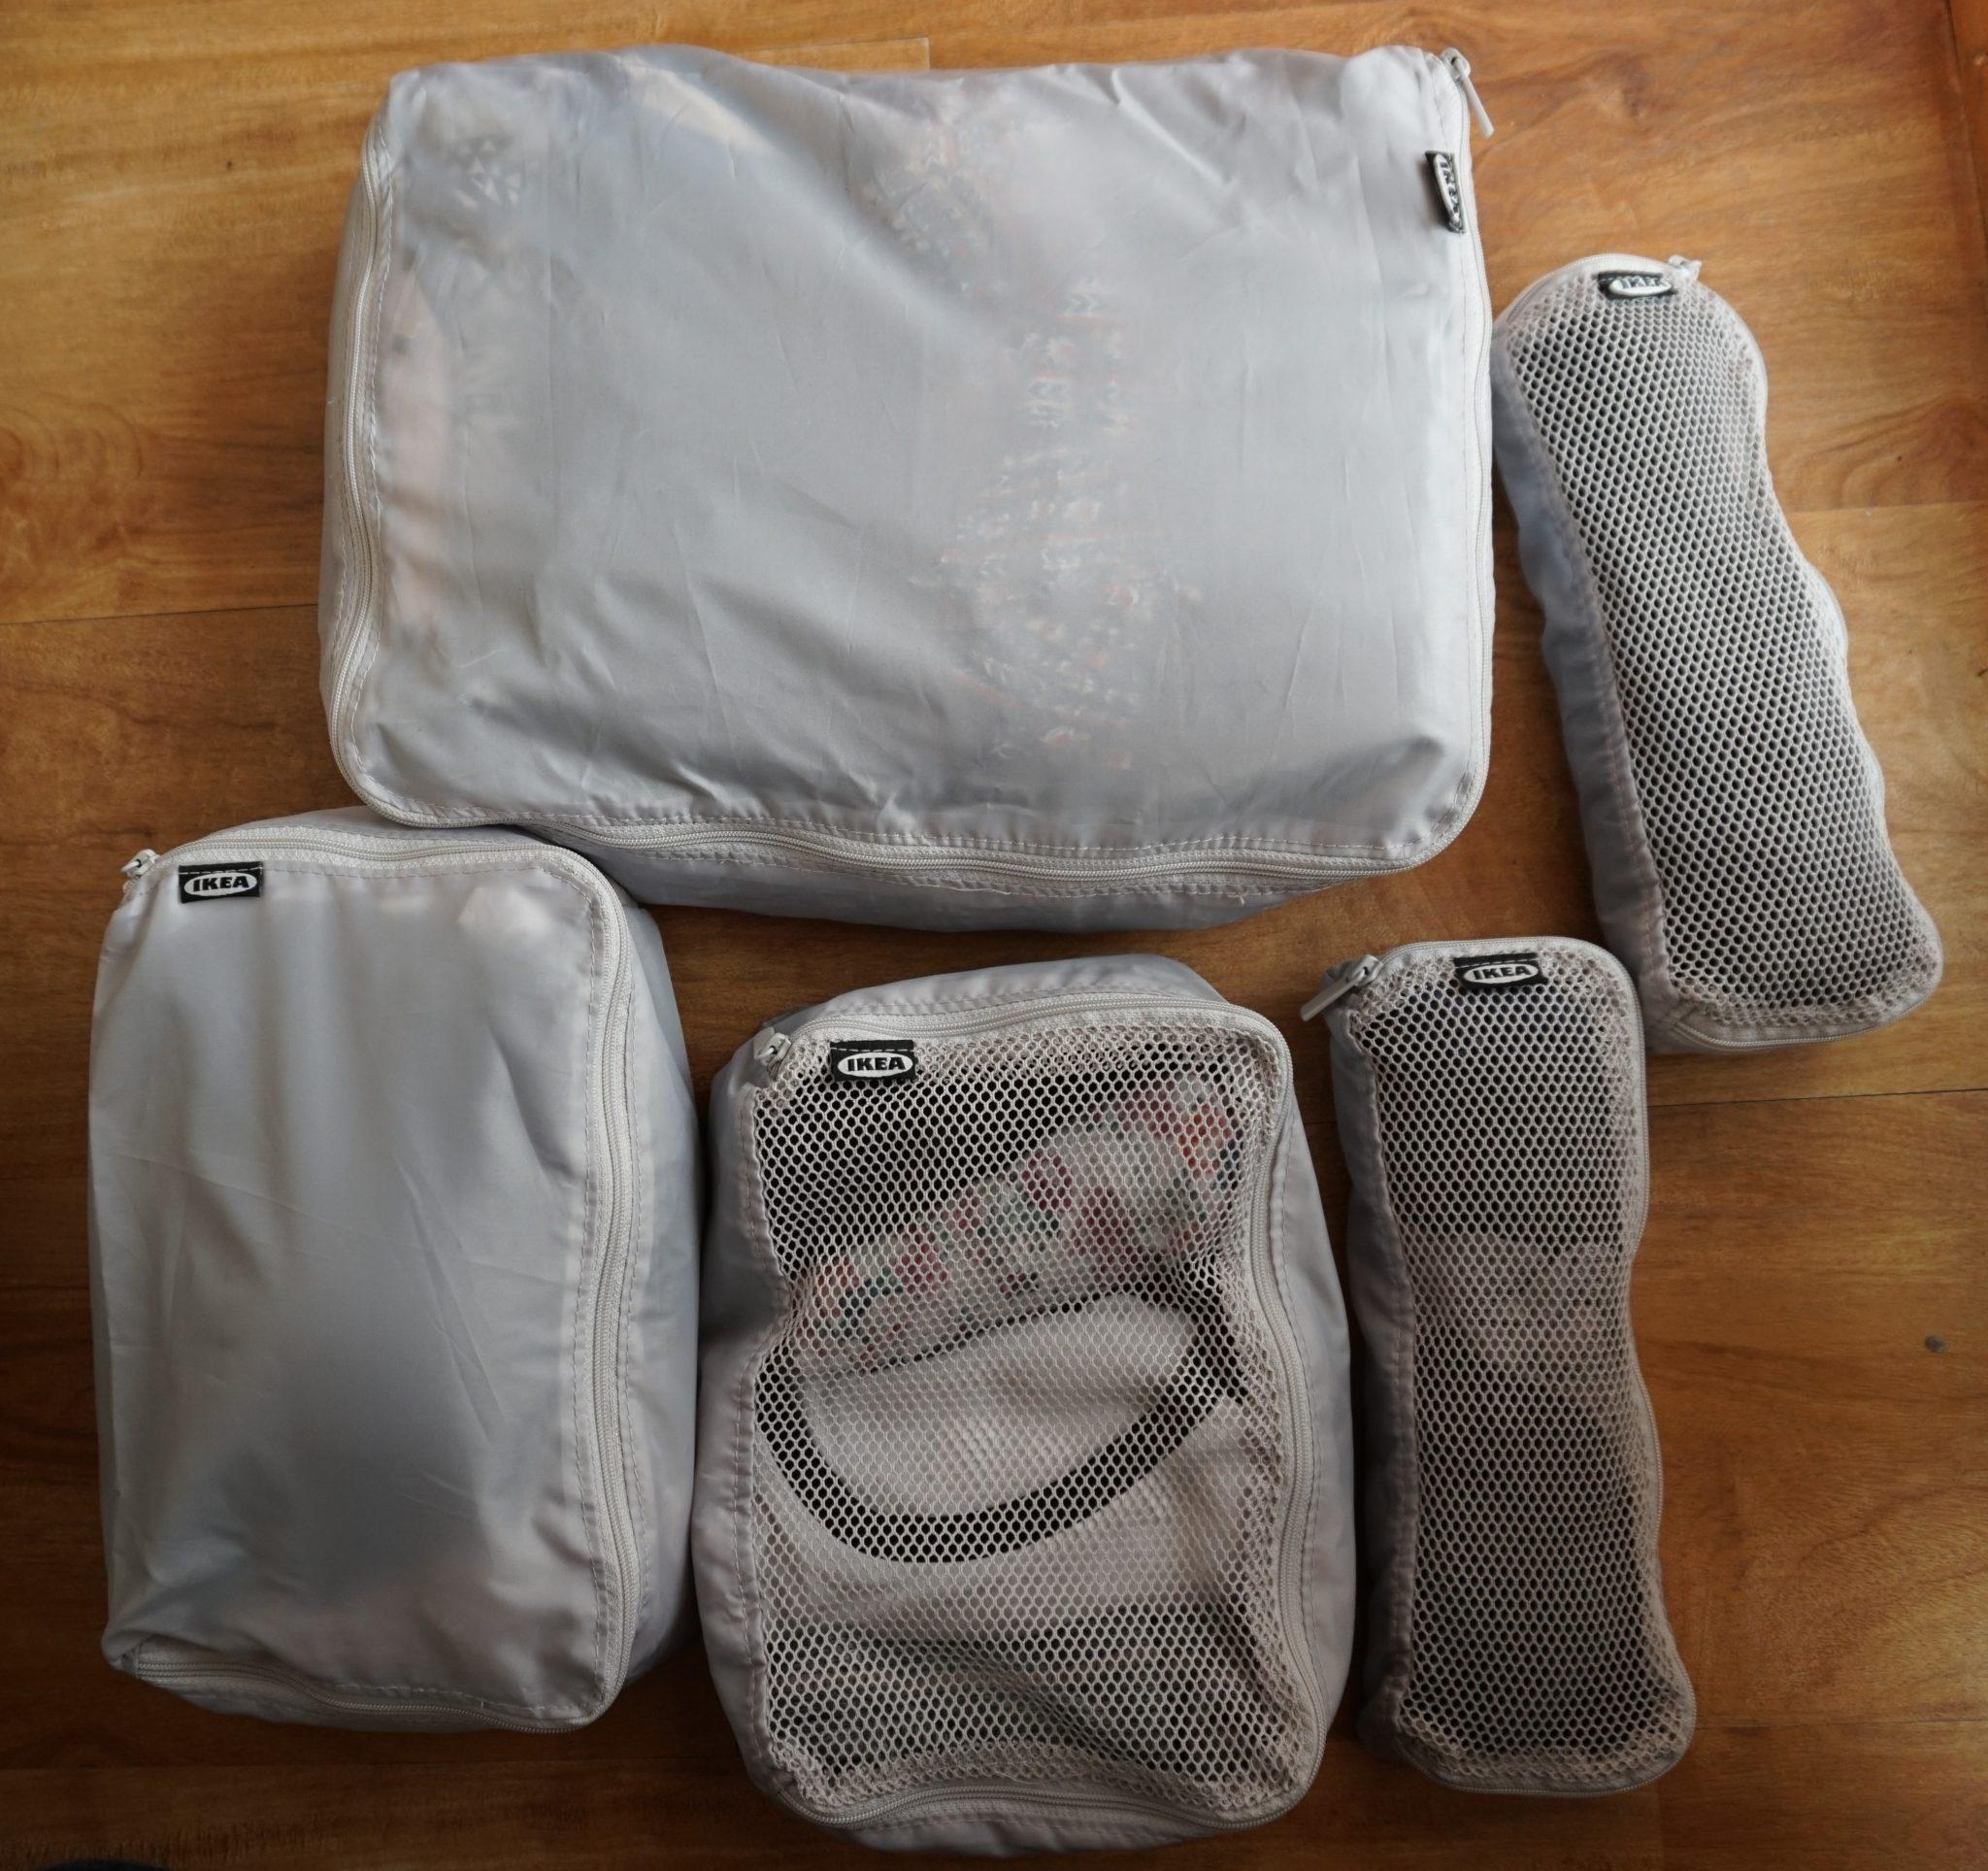 Fünf gepackte IKEA-Packtaschen